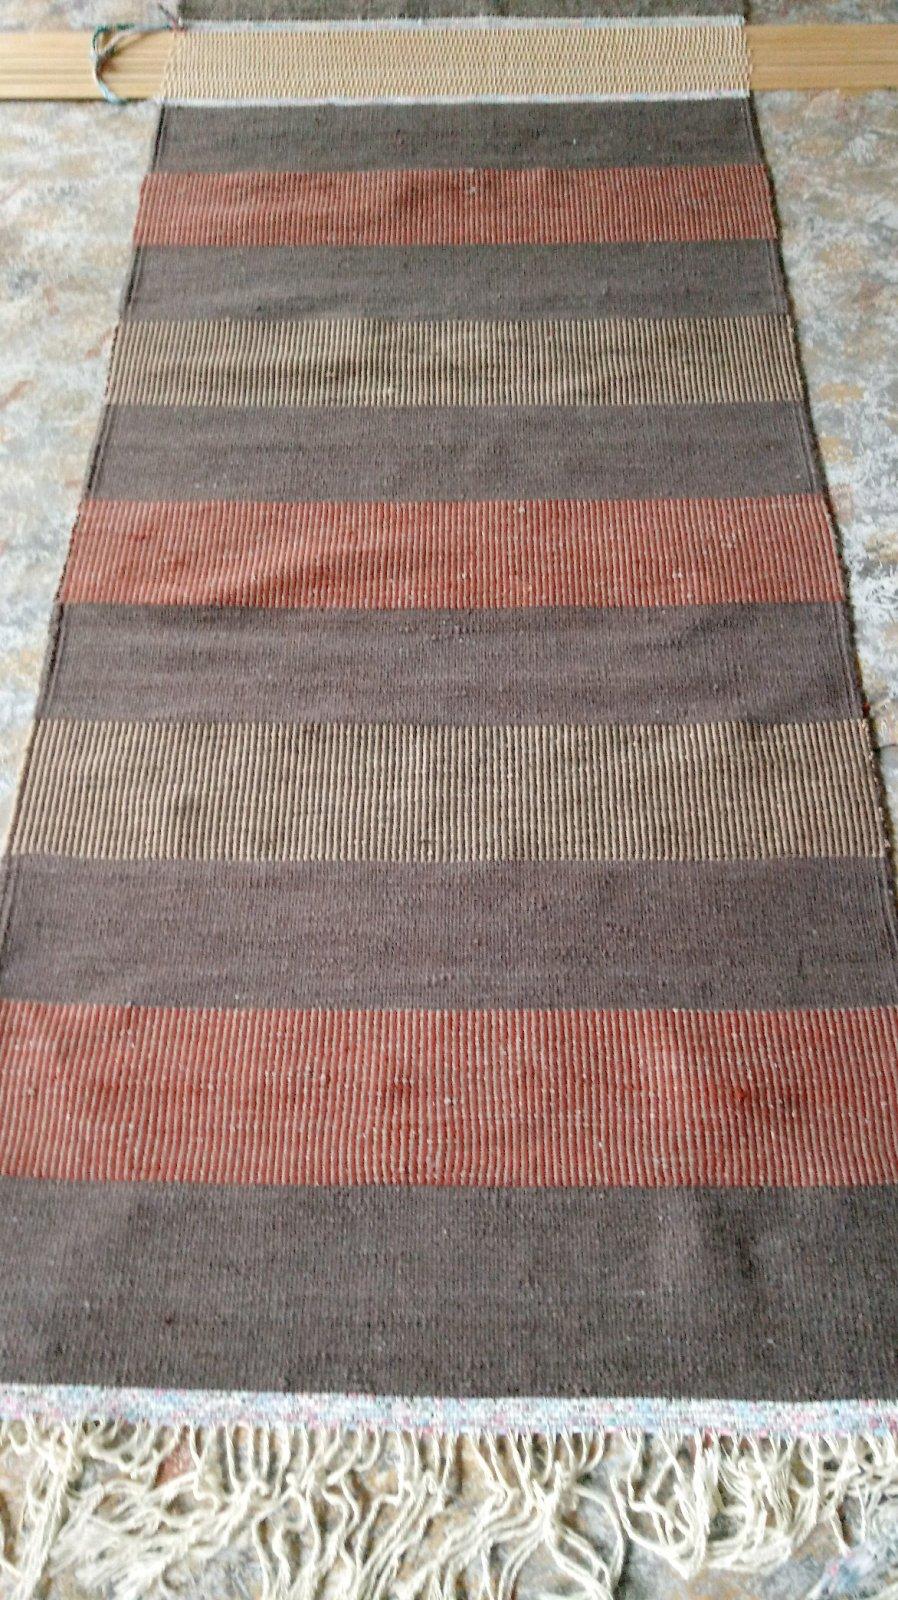 Bison Stripes Rug 3'X6.5' Wool BisonBlend